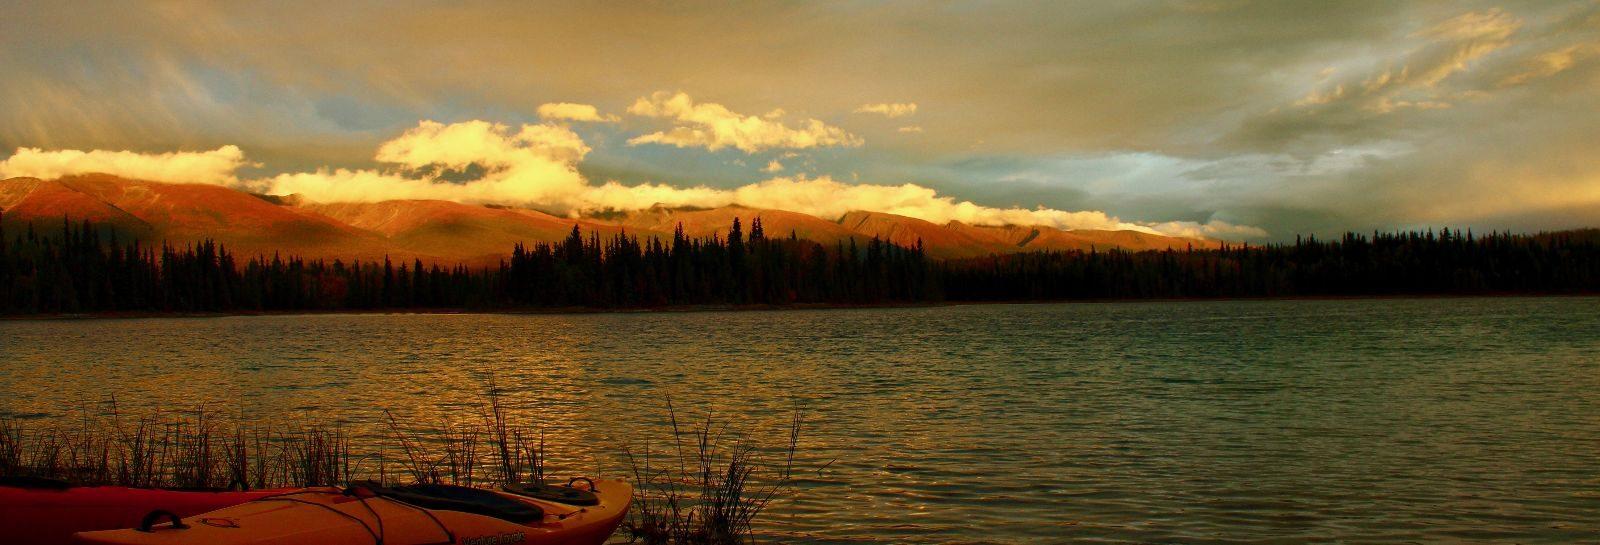 Overland trip through Western Canada and Alaska